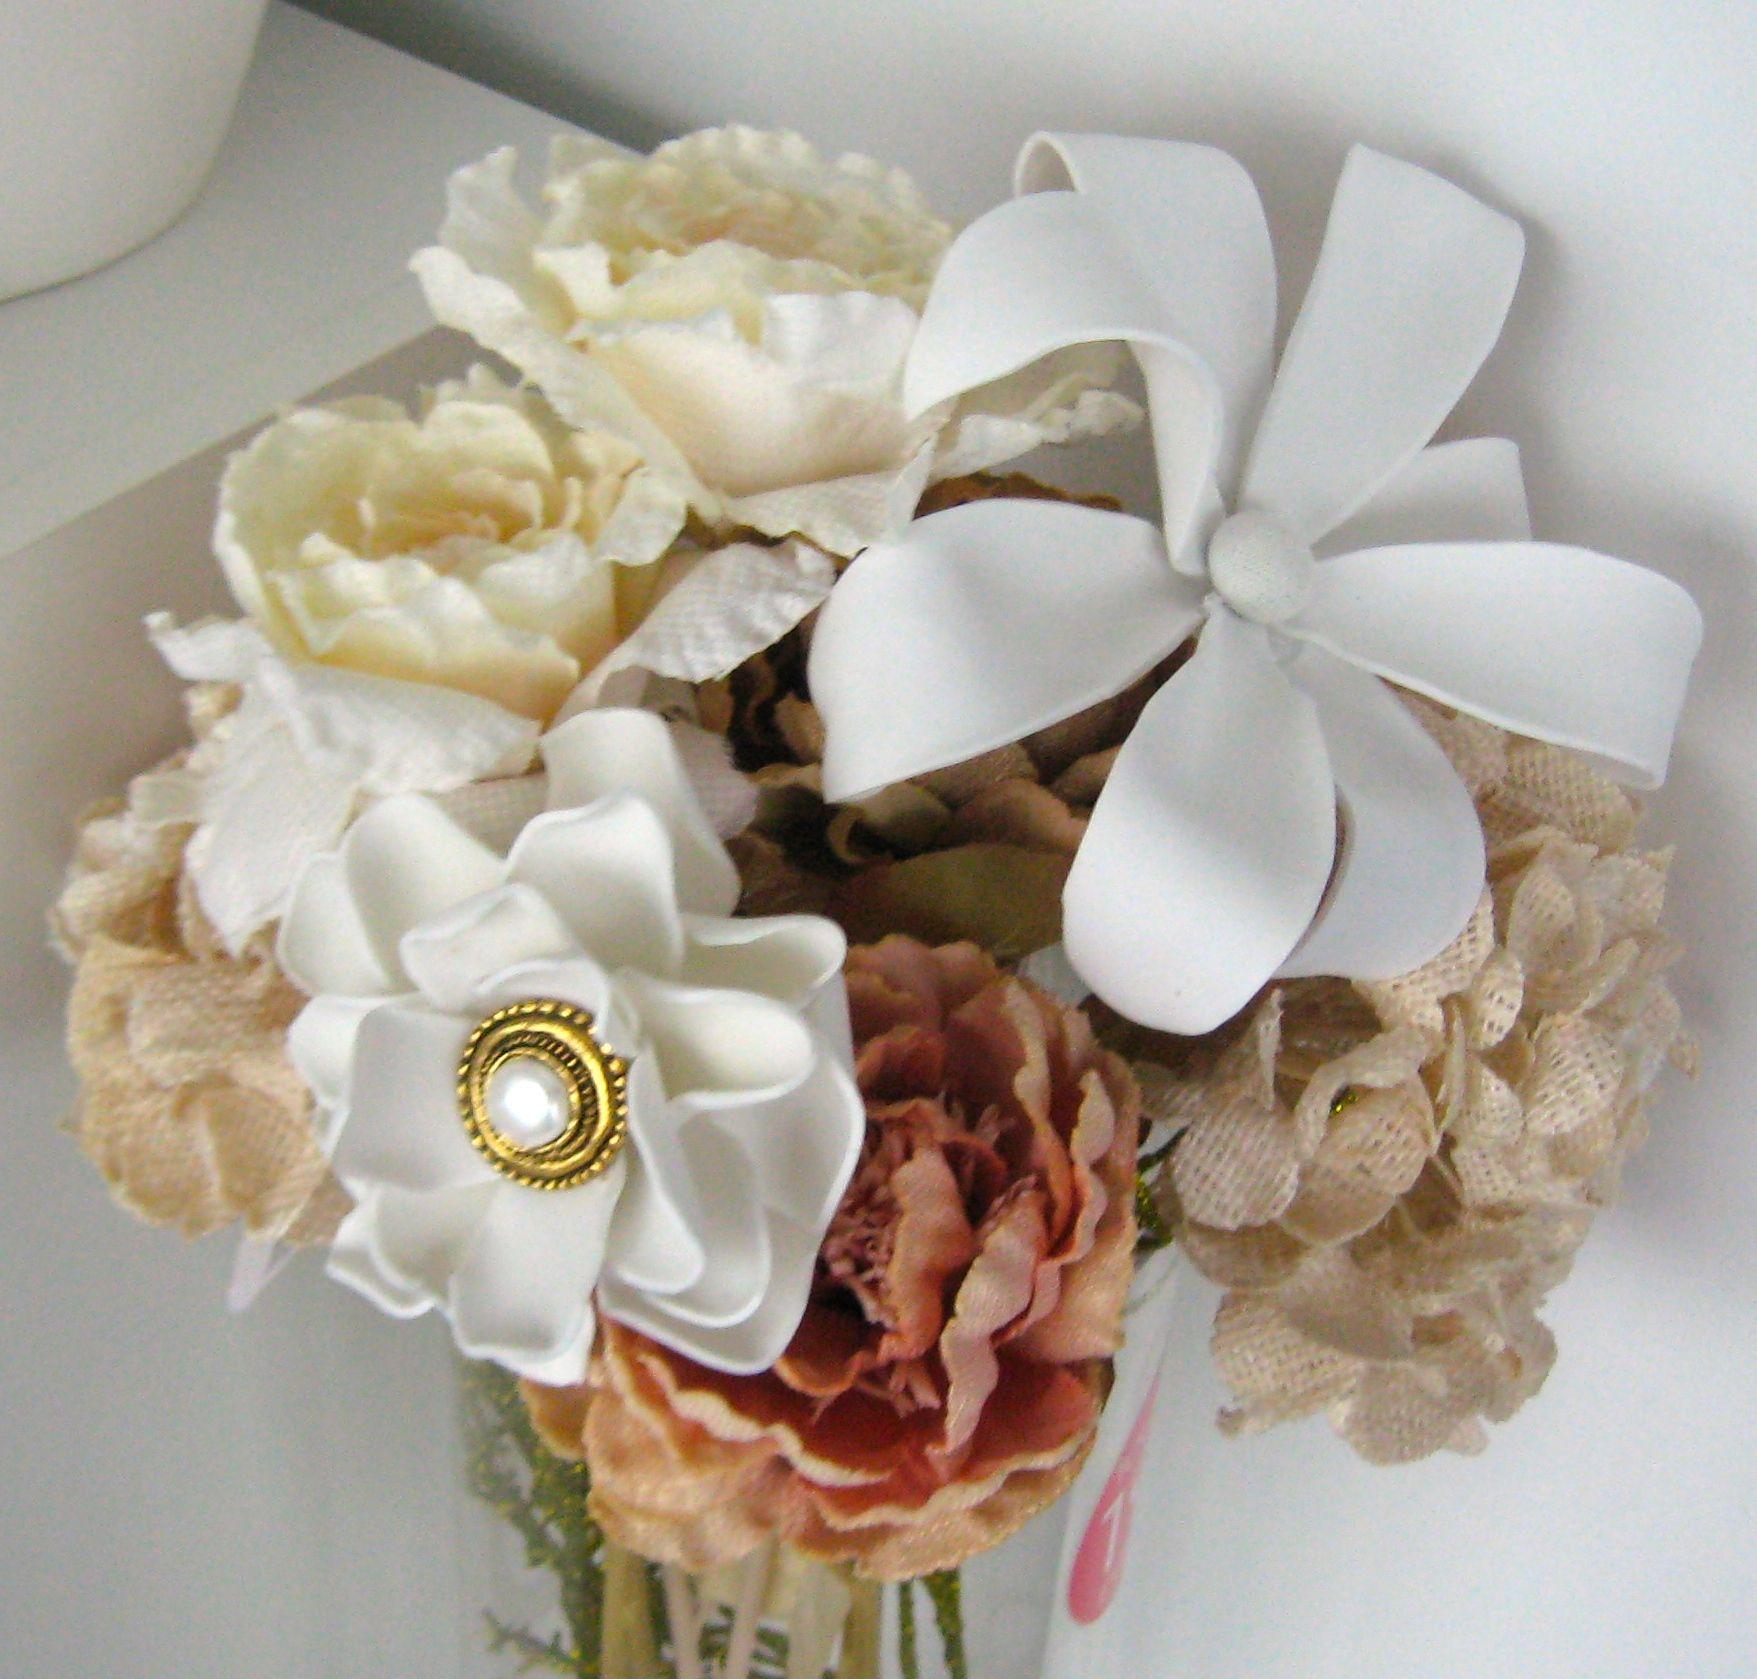 Created a Bride's Bouquet.